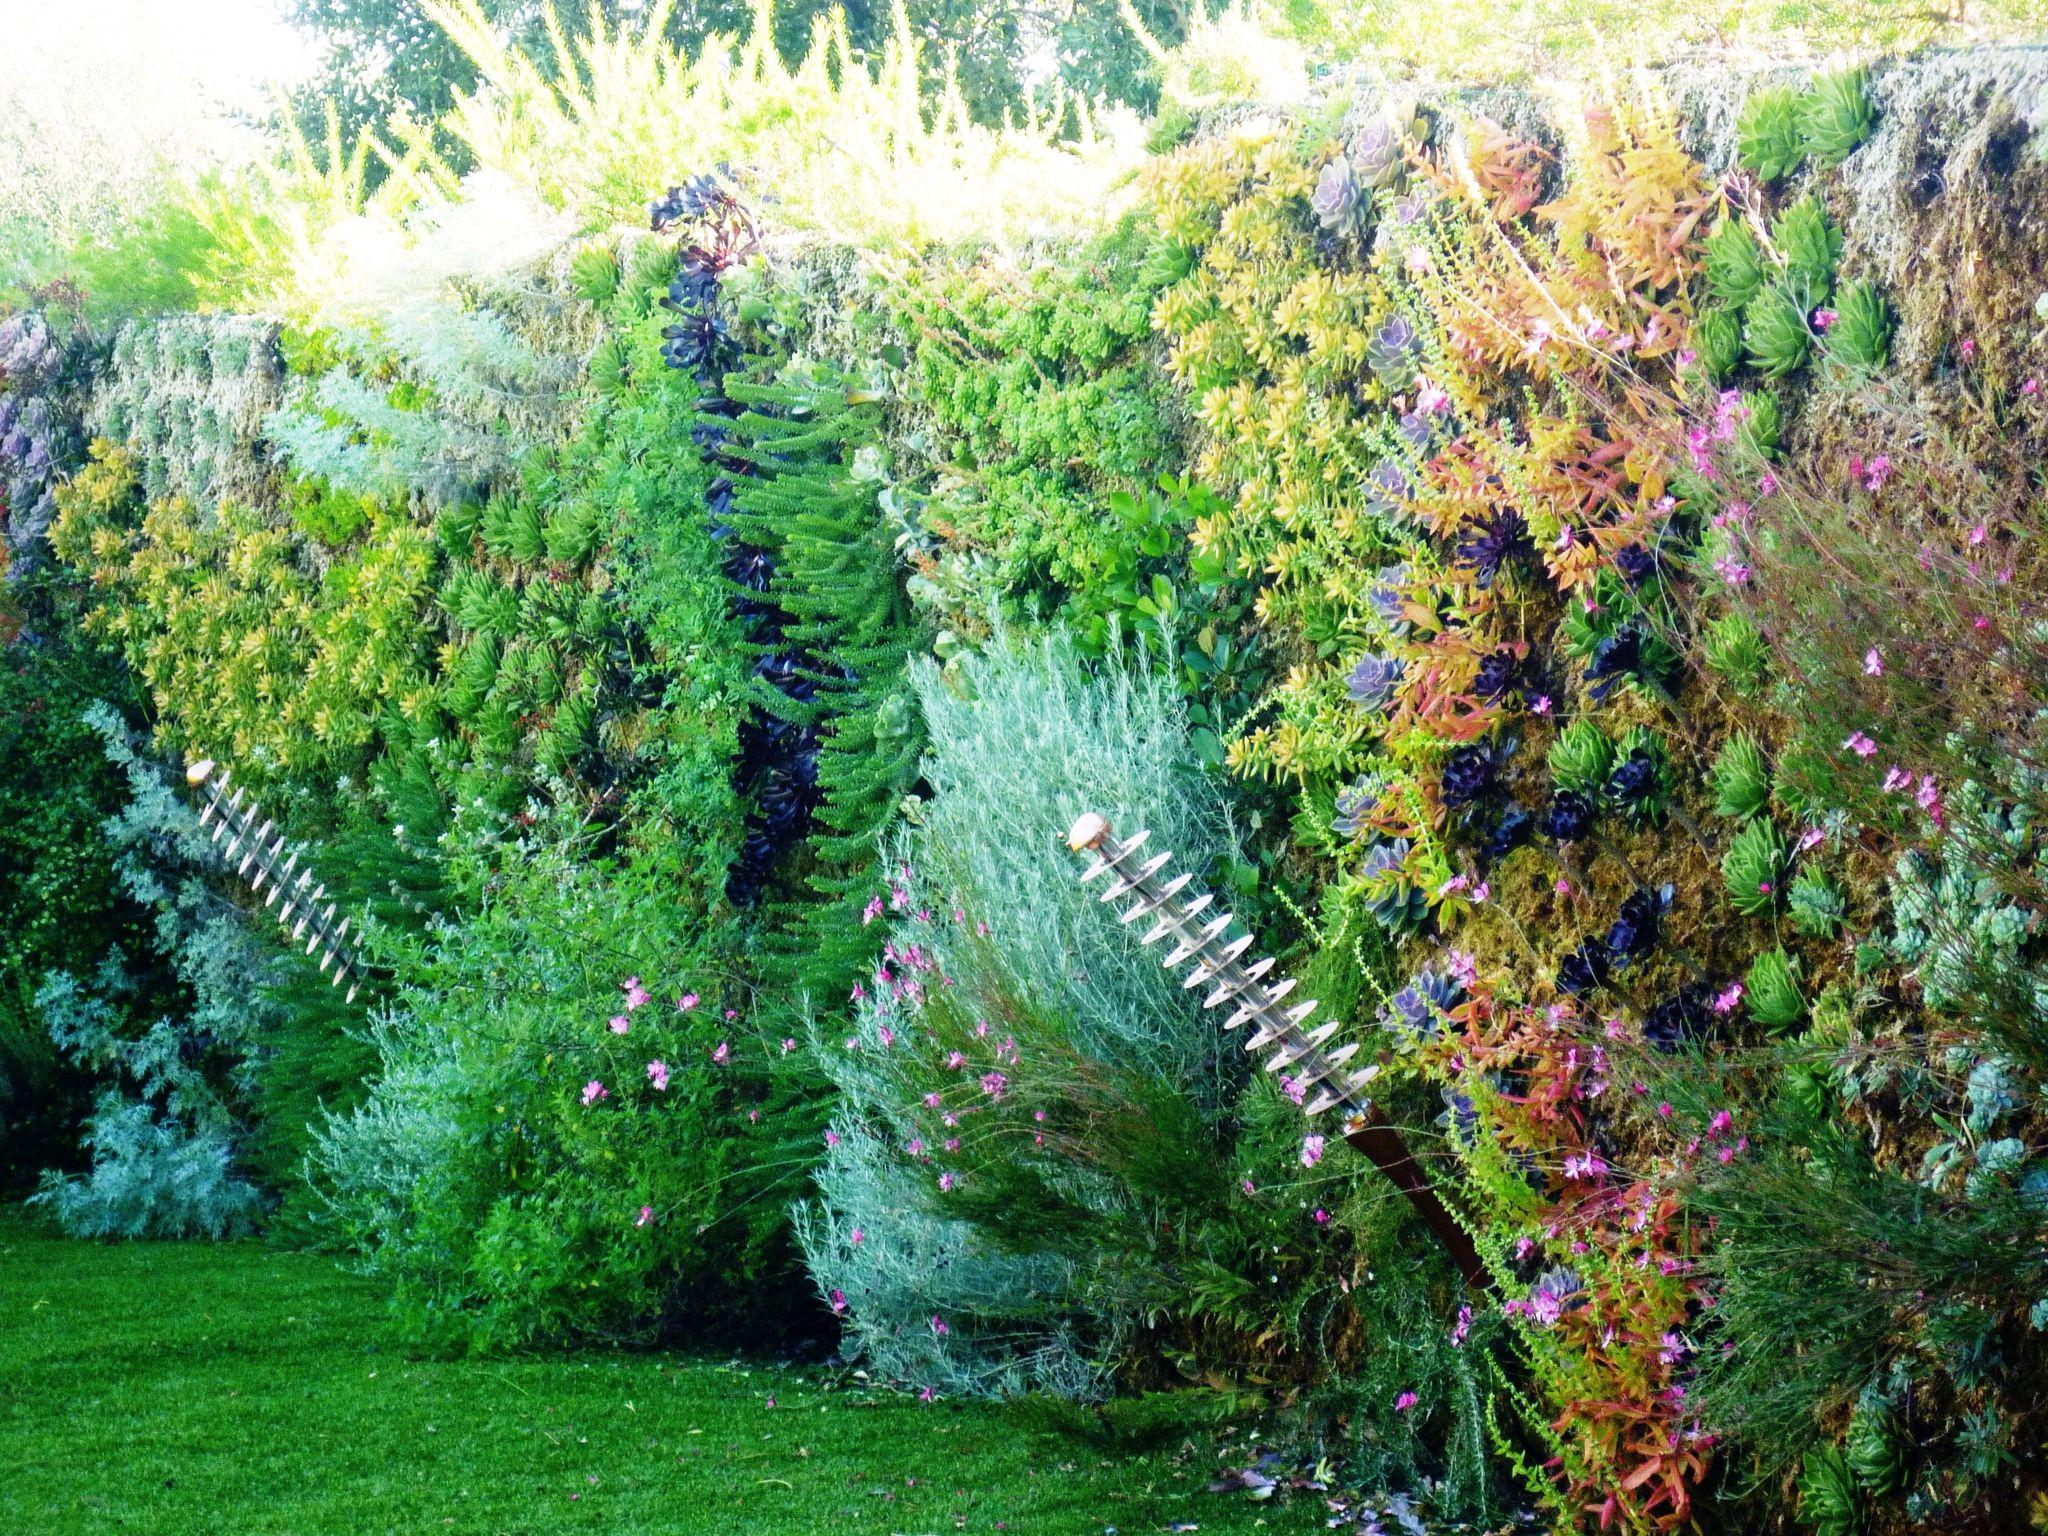 Creation Mur Vegetal Exterieur pieri jardins création mur végétal,jardin contemporain